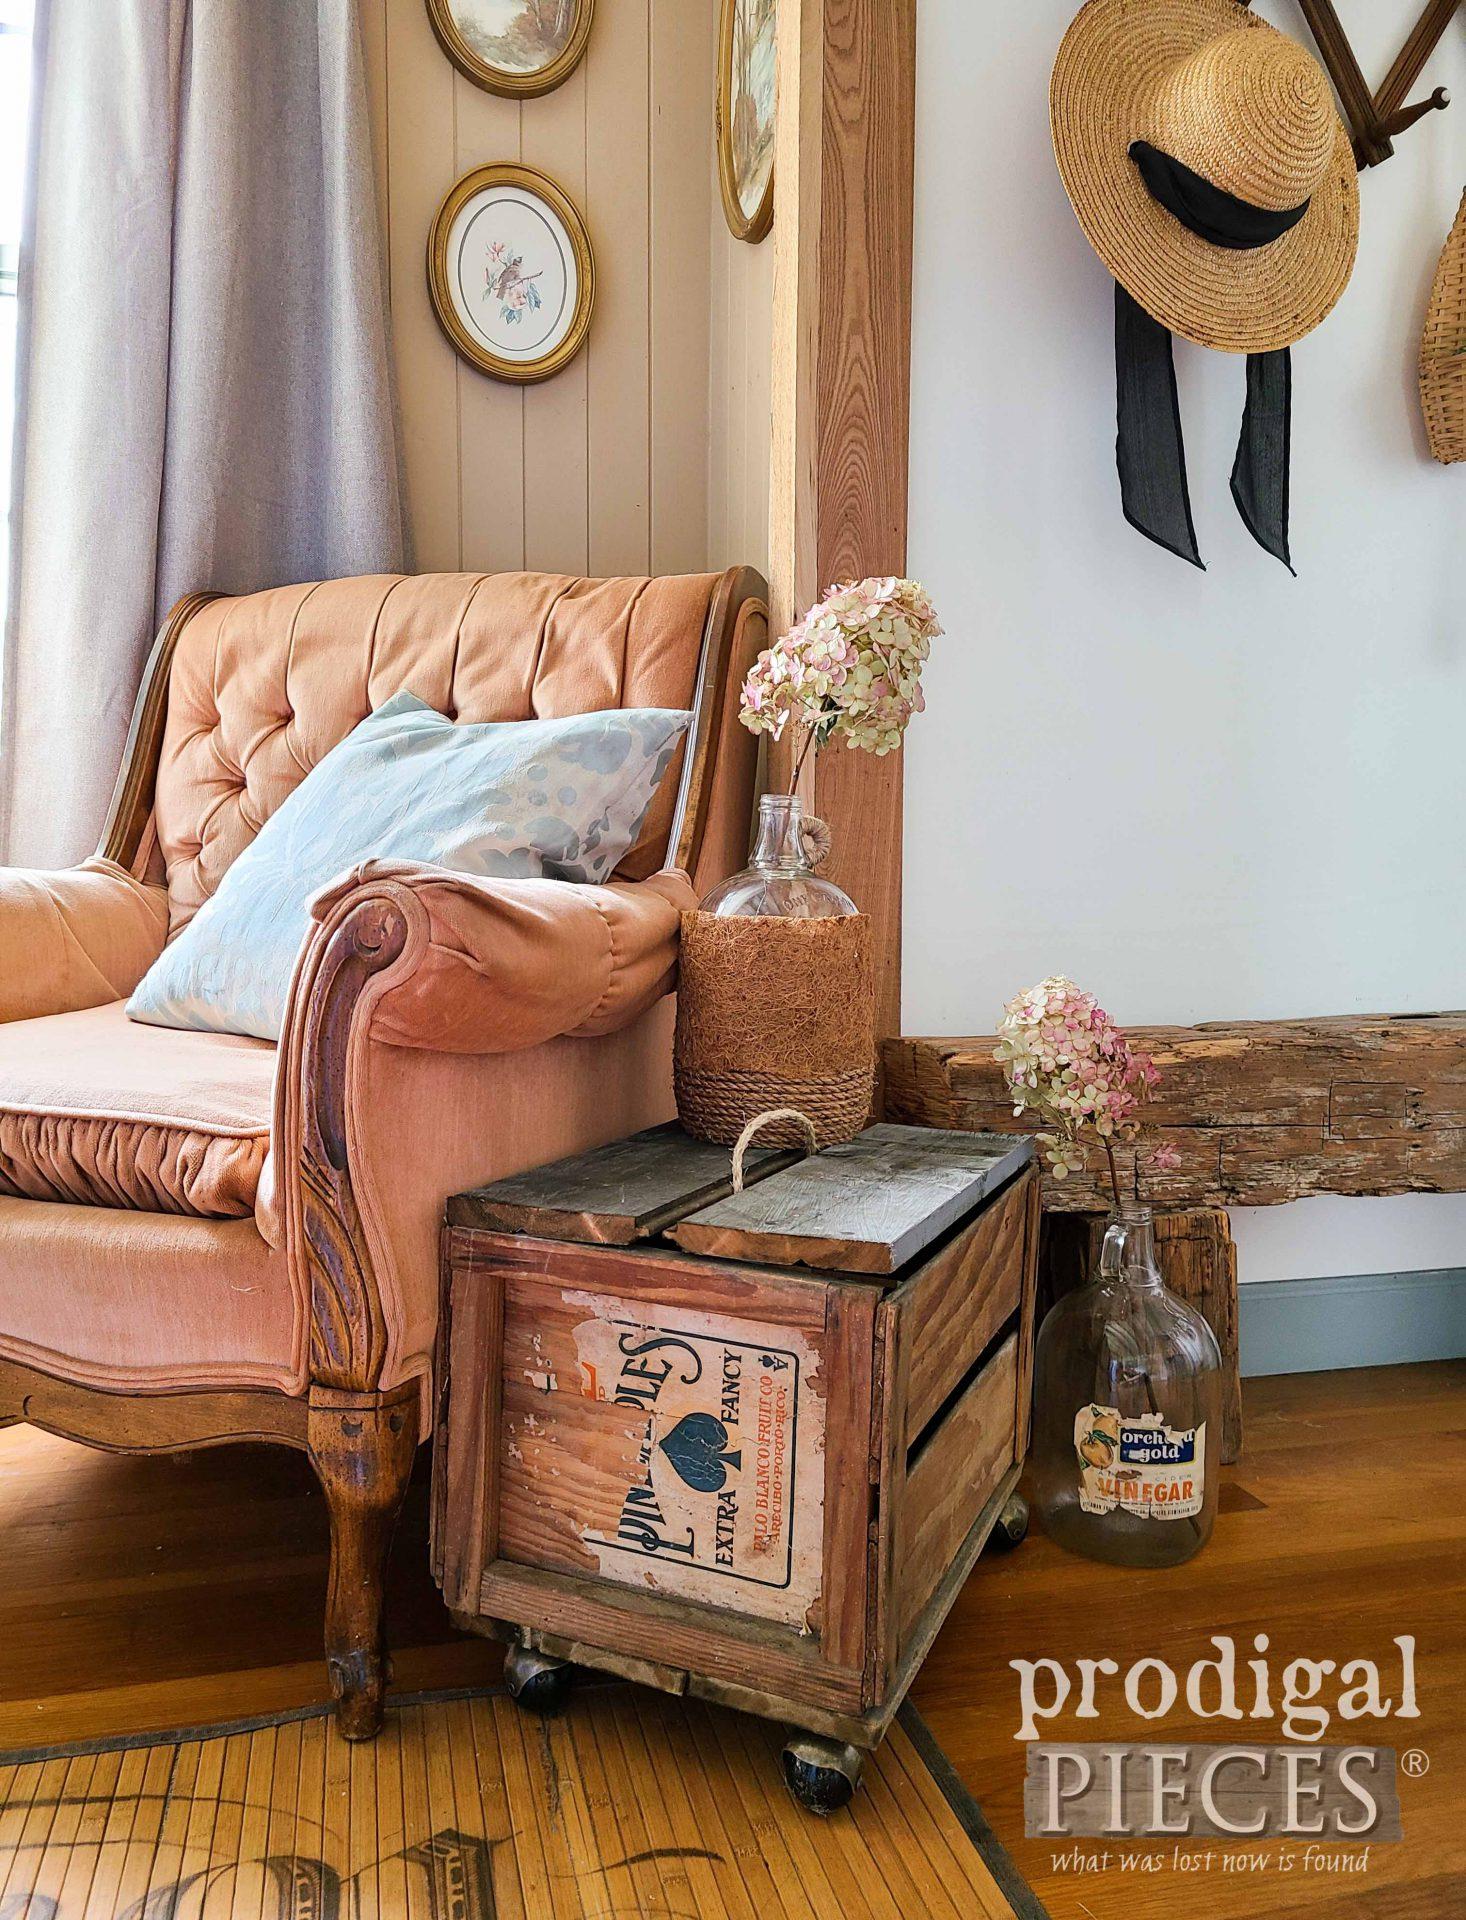 Farmhouse Living Room with Flea Market Decor by Larissa of Prodigal Pieces   prodigalpieces.com #prodigalpieces #farmhouse #fleamarket #home #homedecor #diy